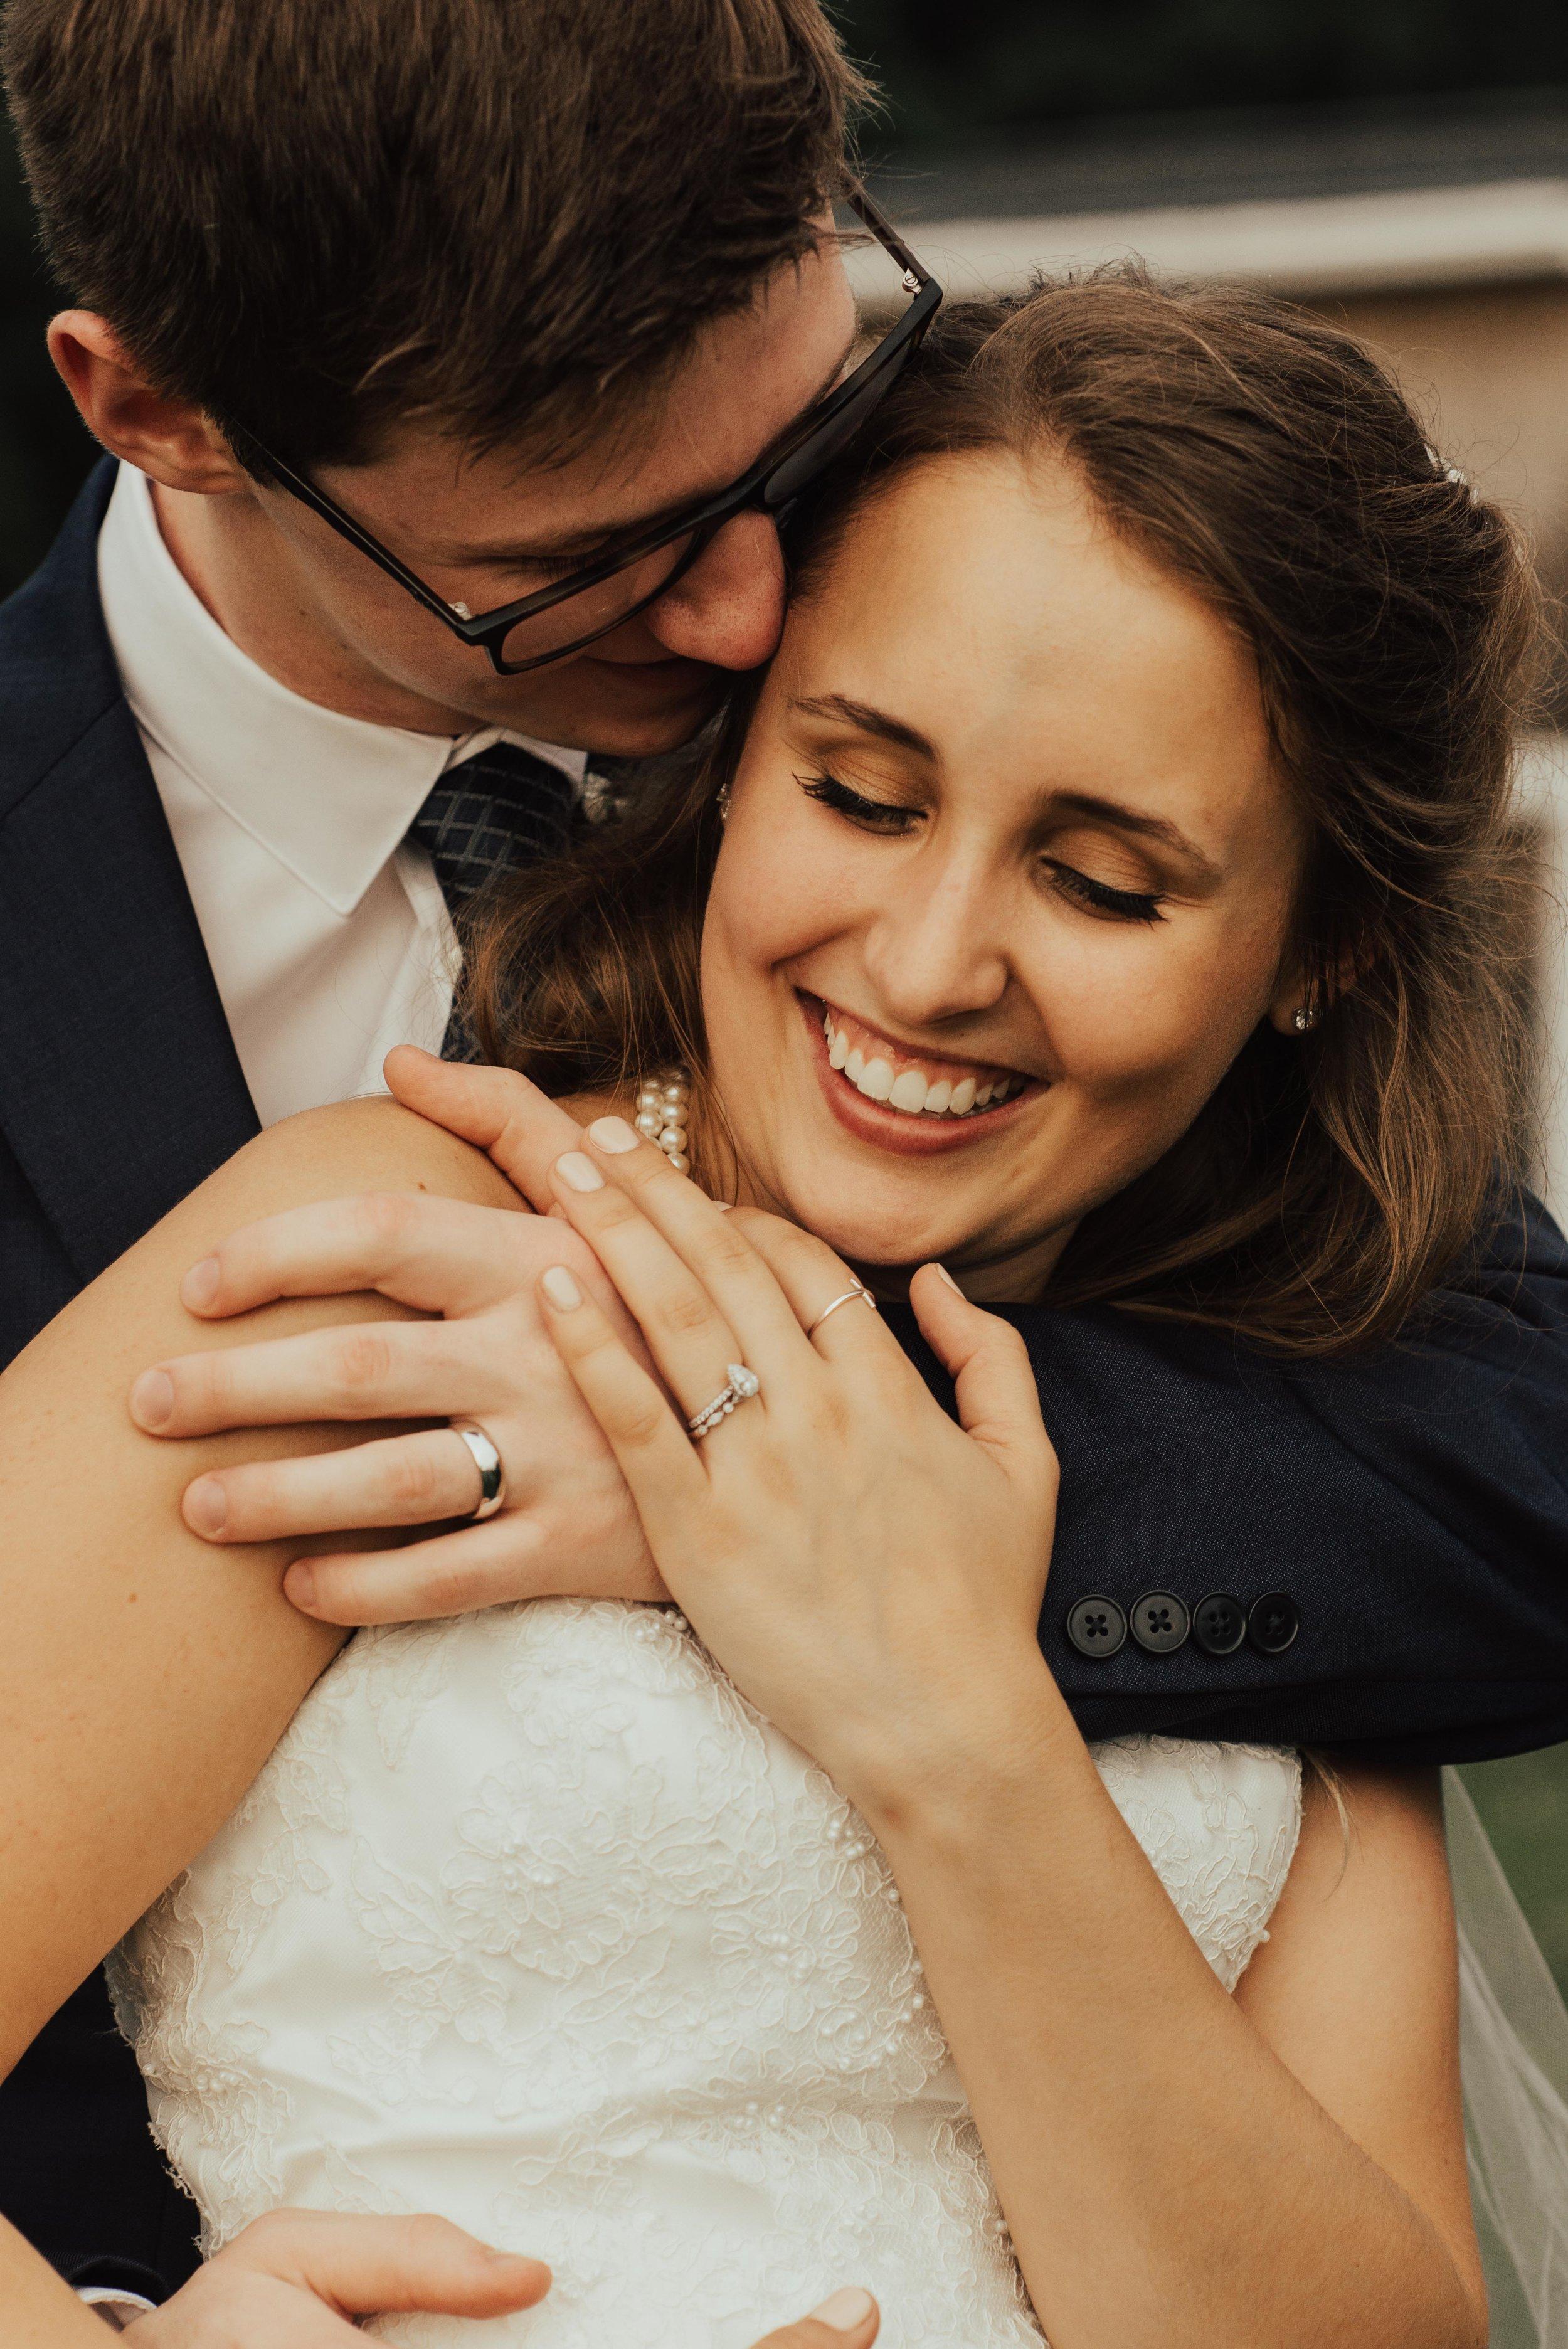 Bride & Groom VIrginia Wedding. SB Photographs.jpg